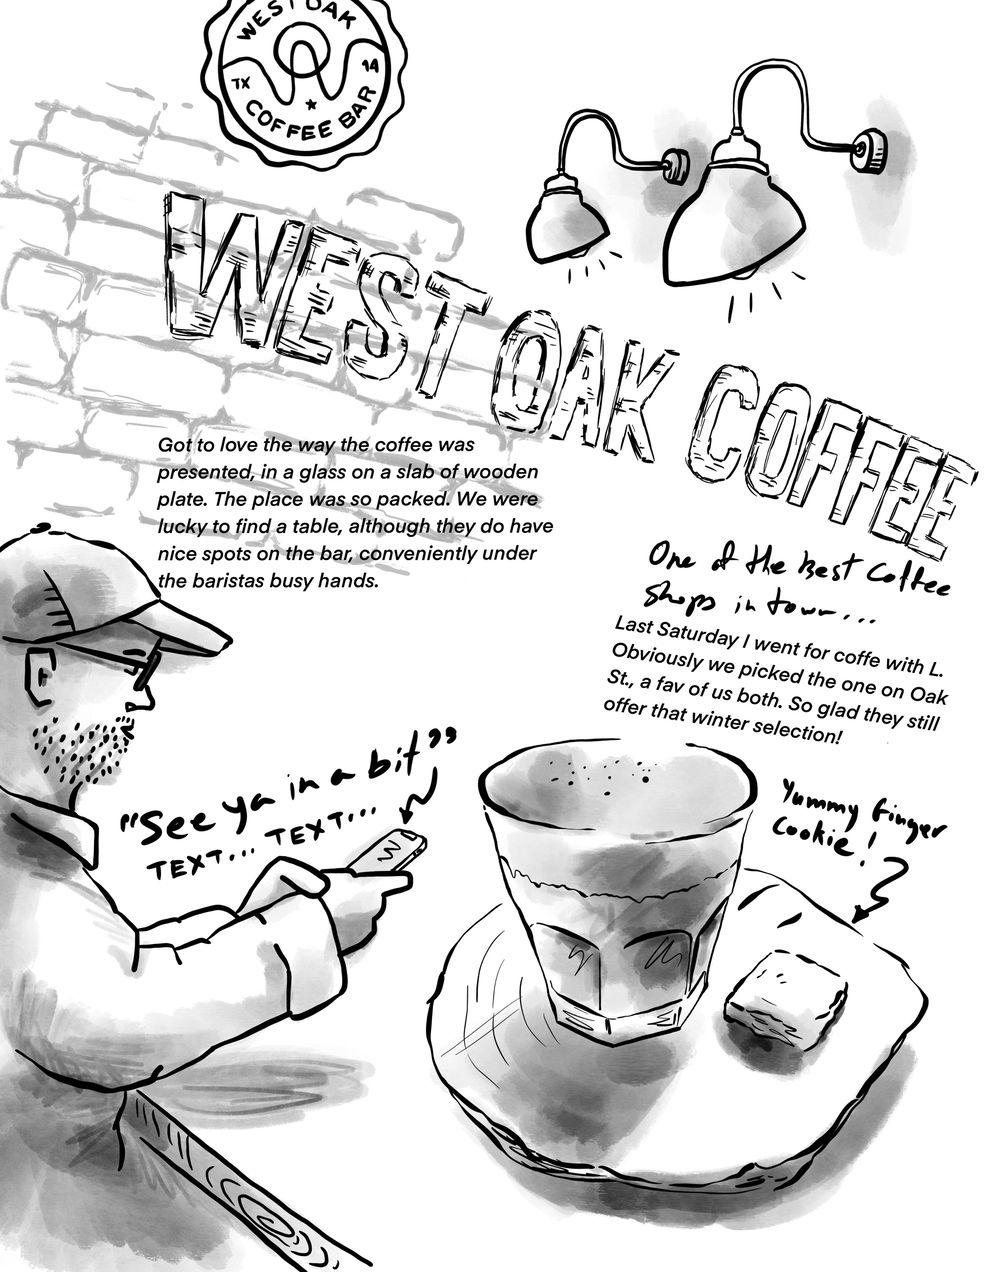 West Oak Cafe - image 2 - student project